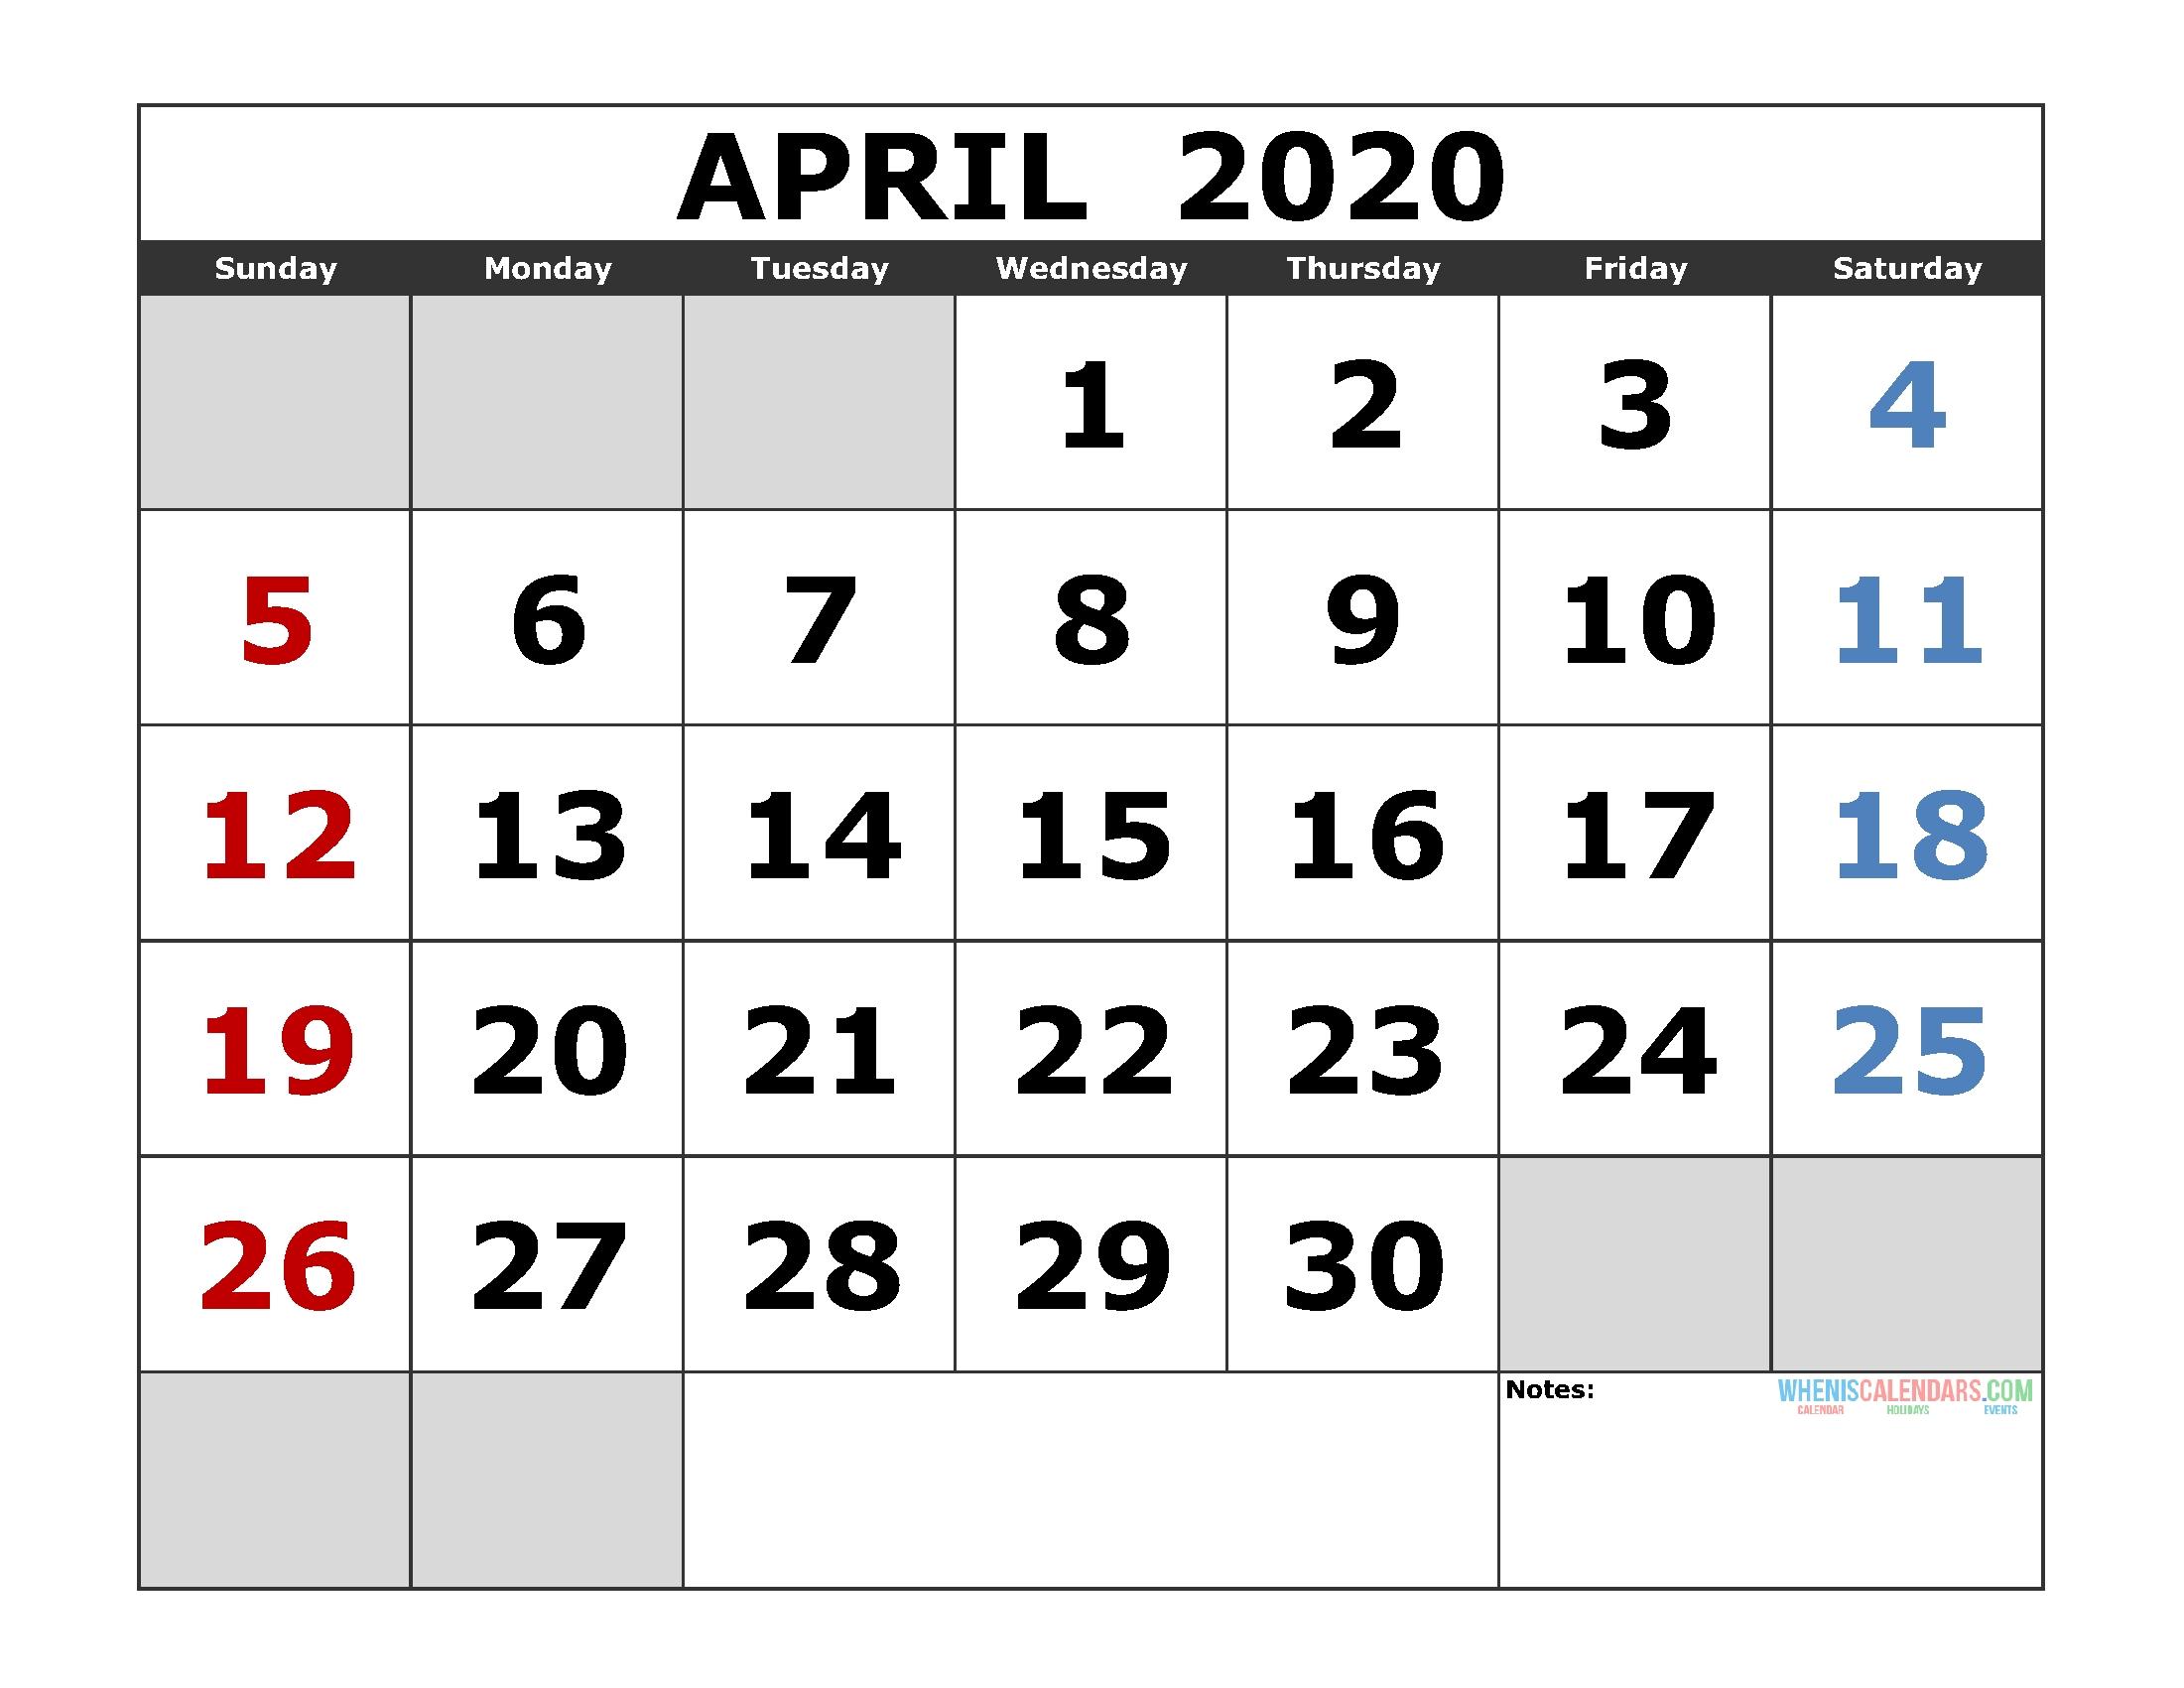 April 2020 Printable Calendar Template Excel, Pdf, Image [Us